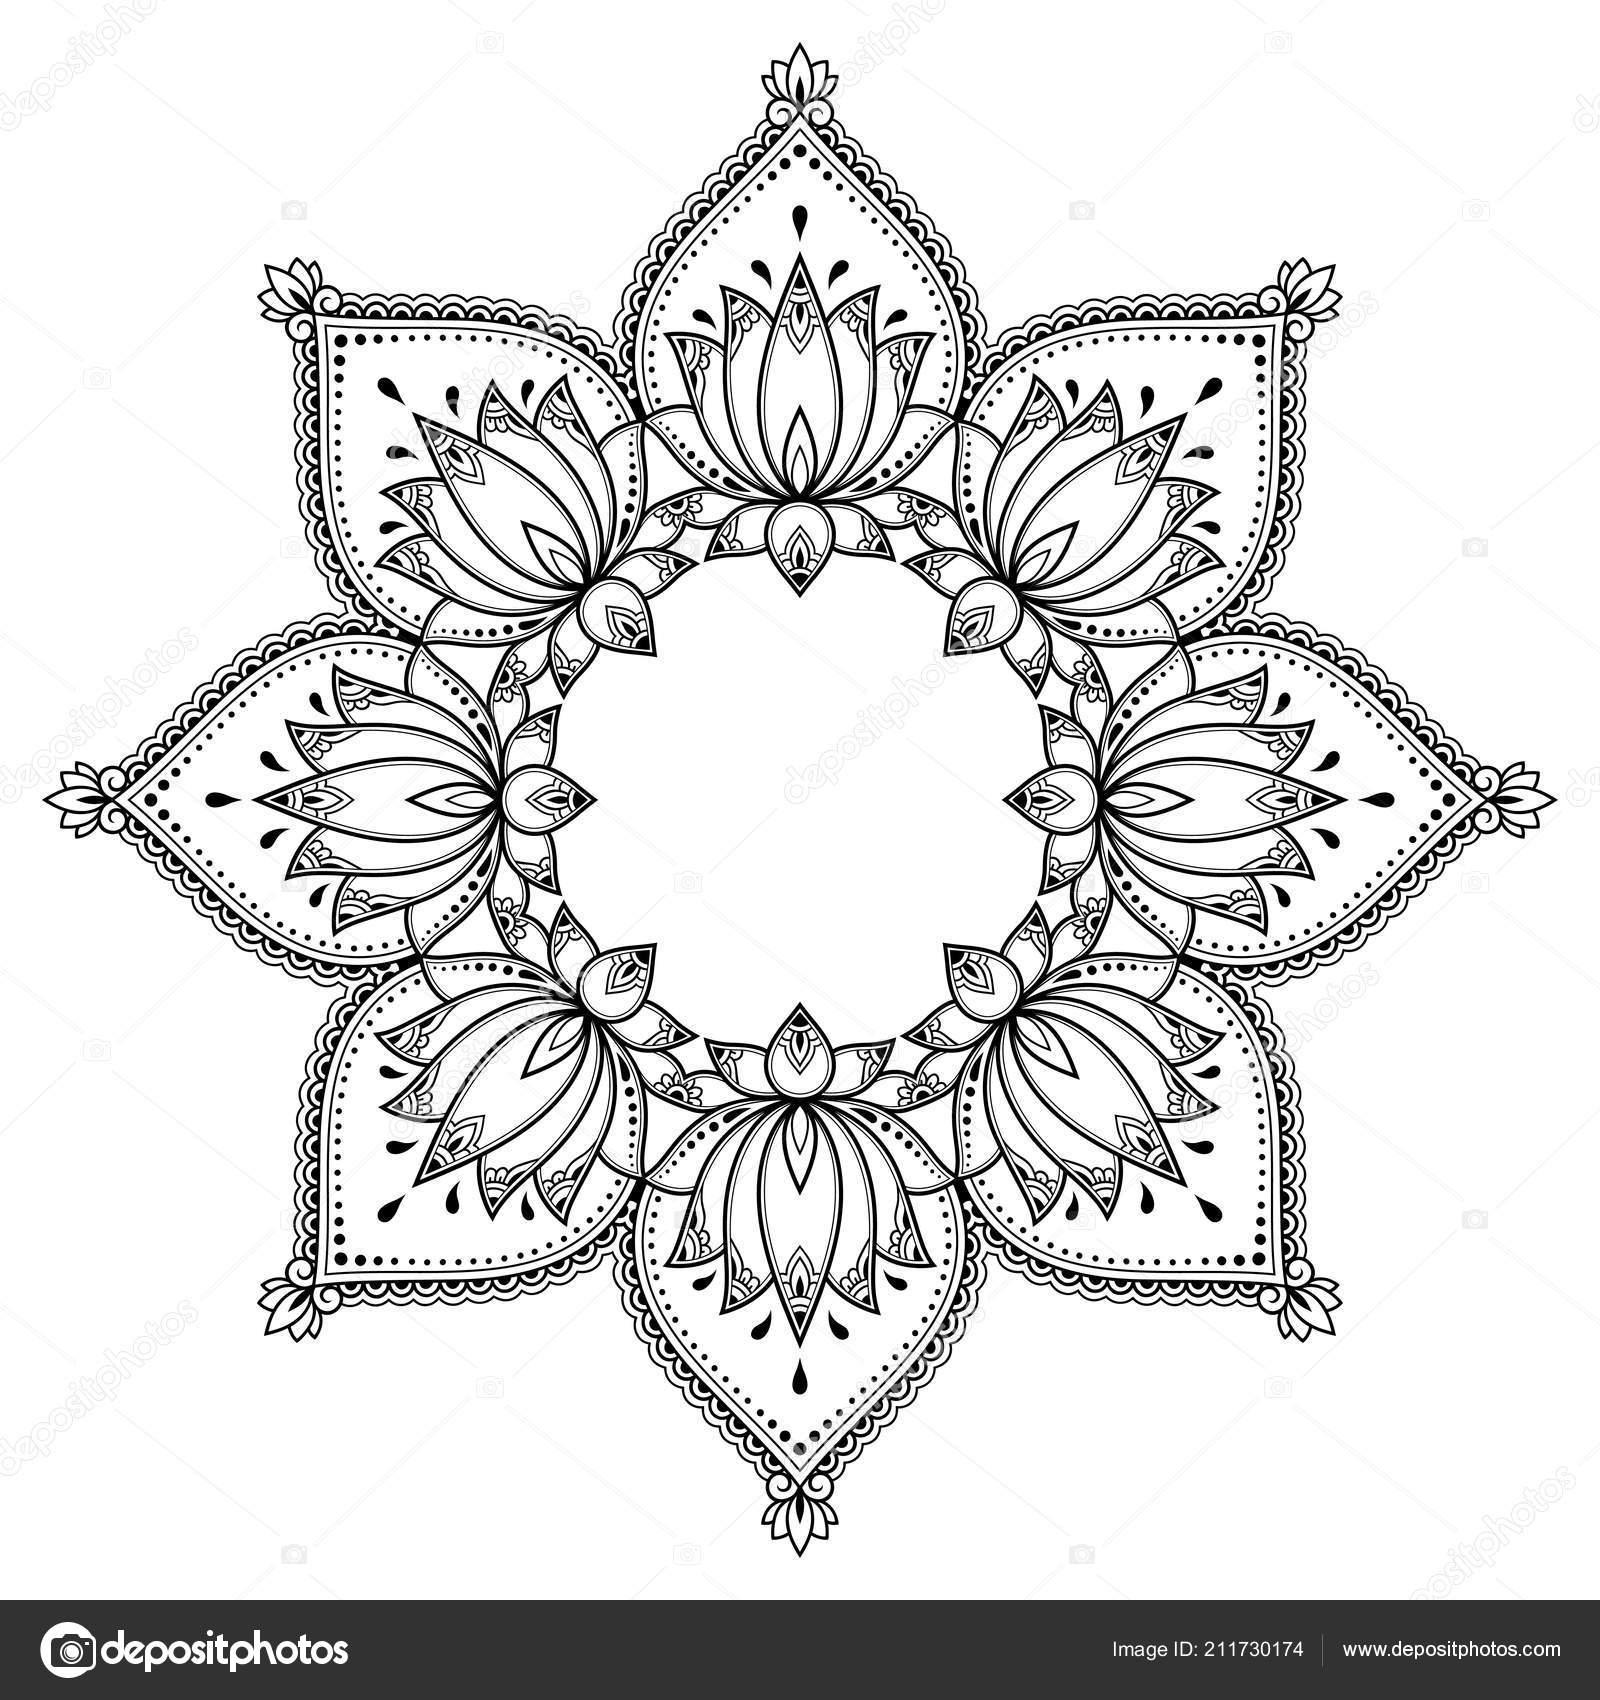 Patrón Circular Forma Mandala Con Flor Loto Para Henna Mehndi